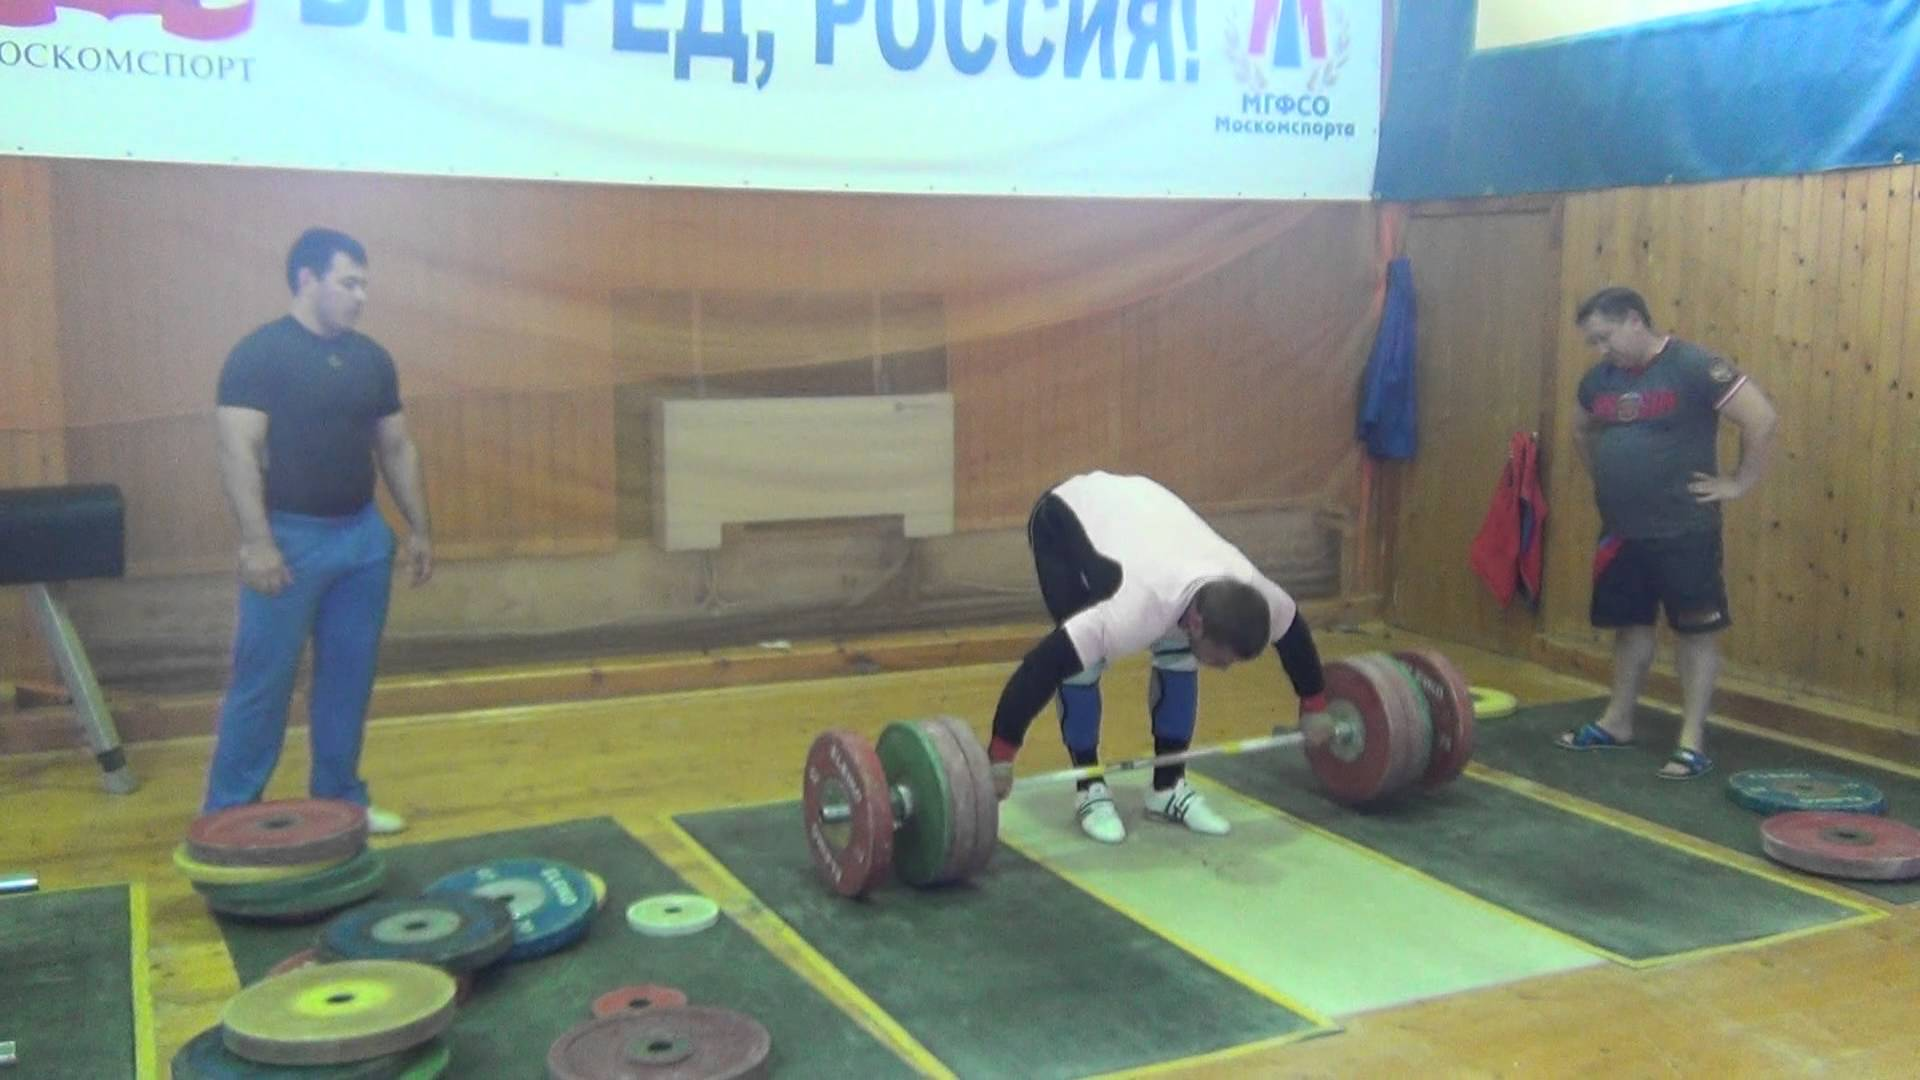 Dmitry Klokov 4+1 Snatch Grip Deadlift + Snatch - All ...